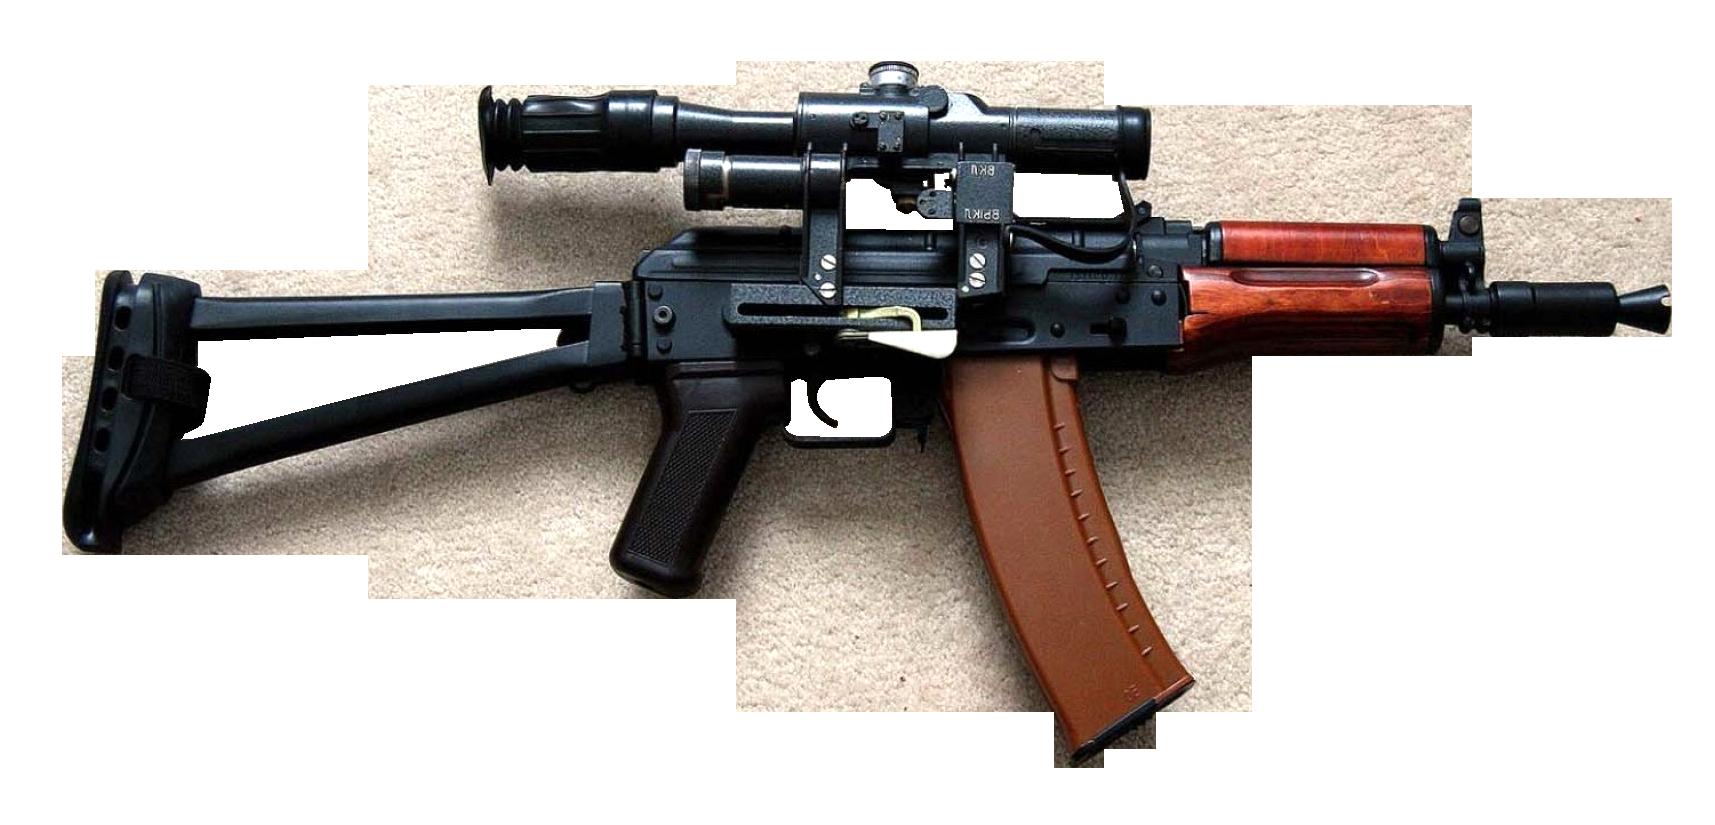 Rifle png hd transparent. Clipart gun hunting gun